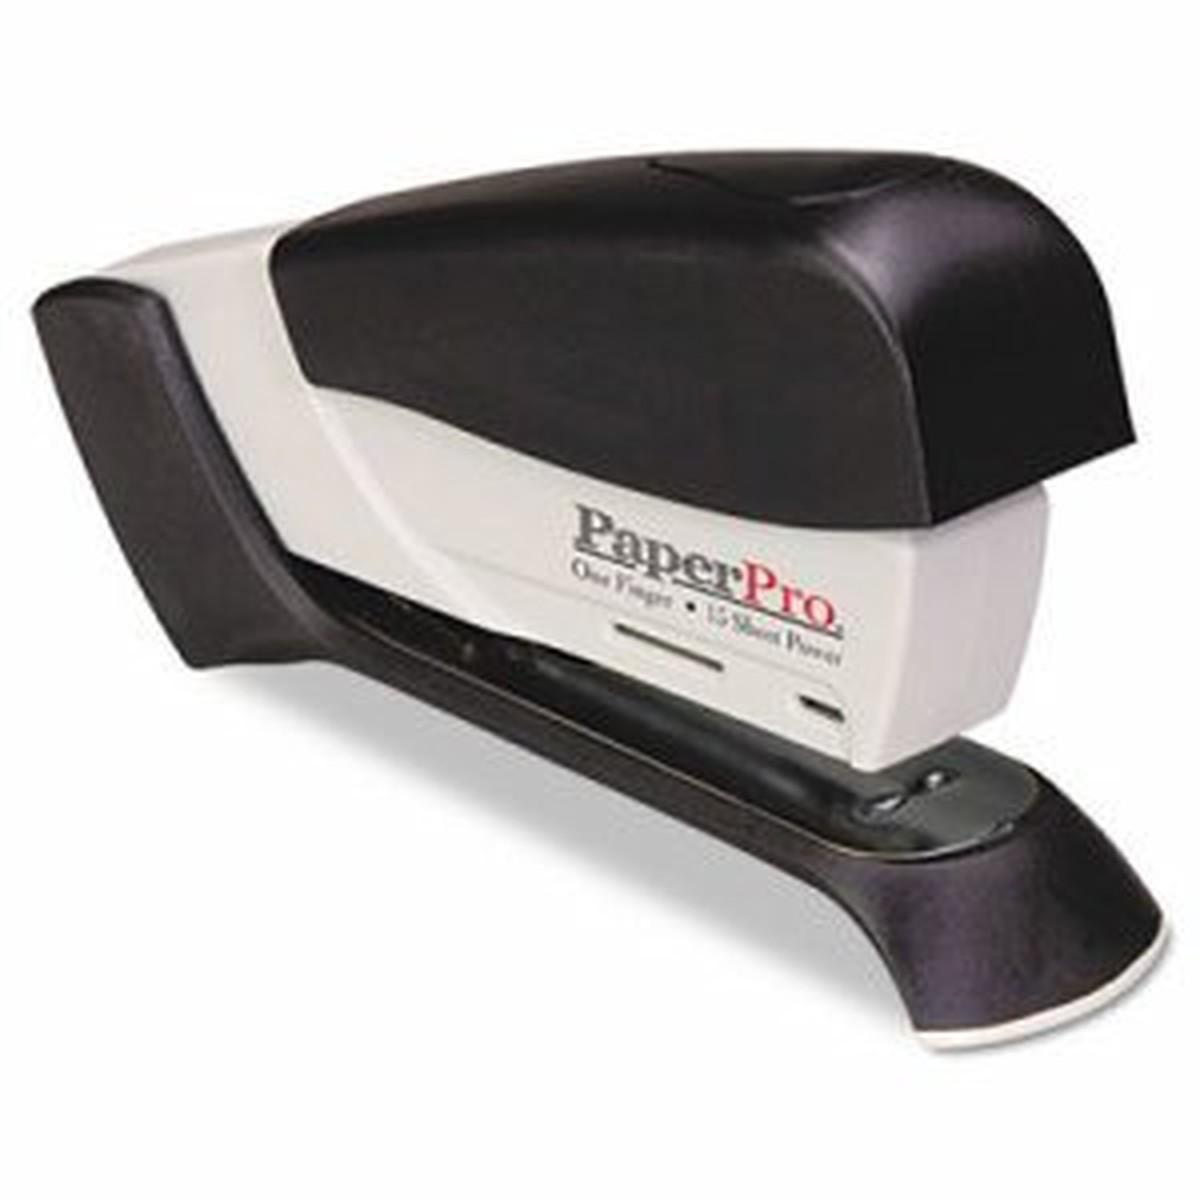 inJoy 20 Compact Stapler, 20-Sheet Capacity, Black